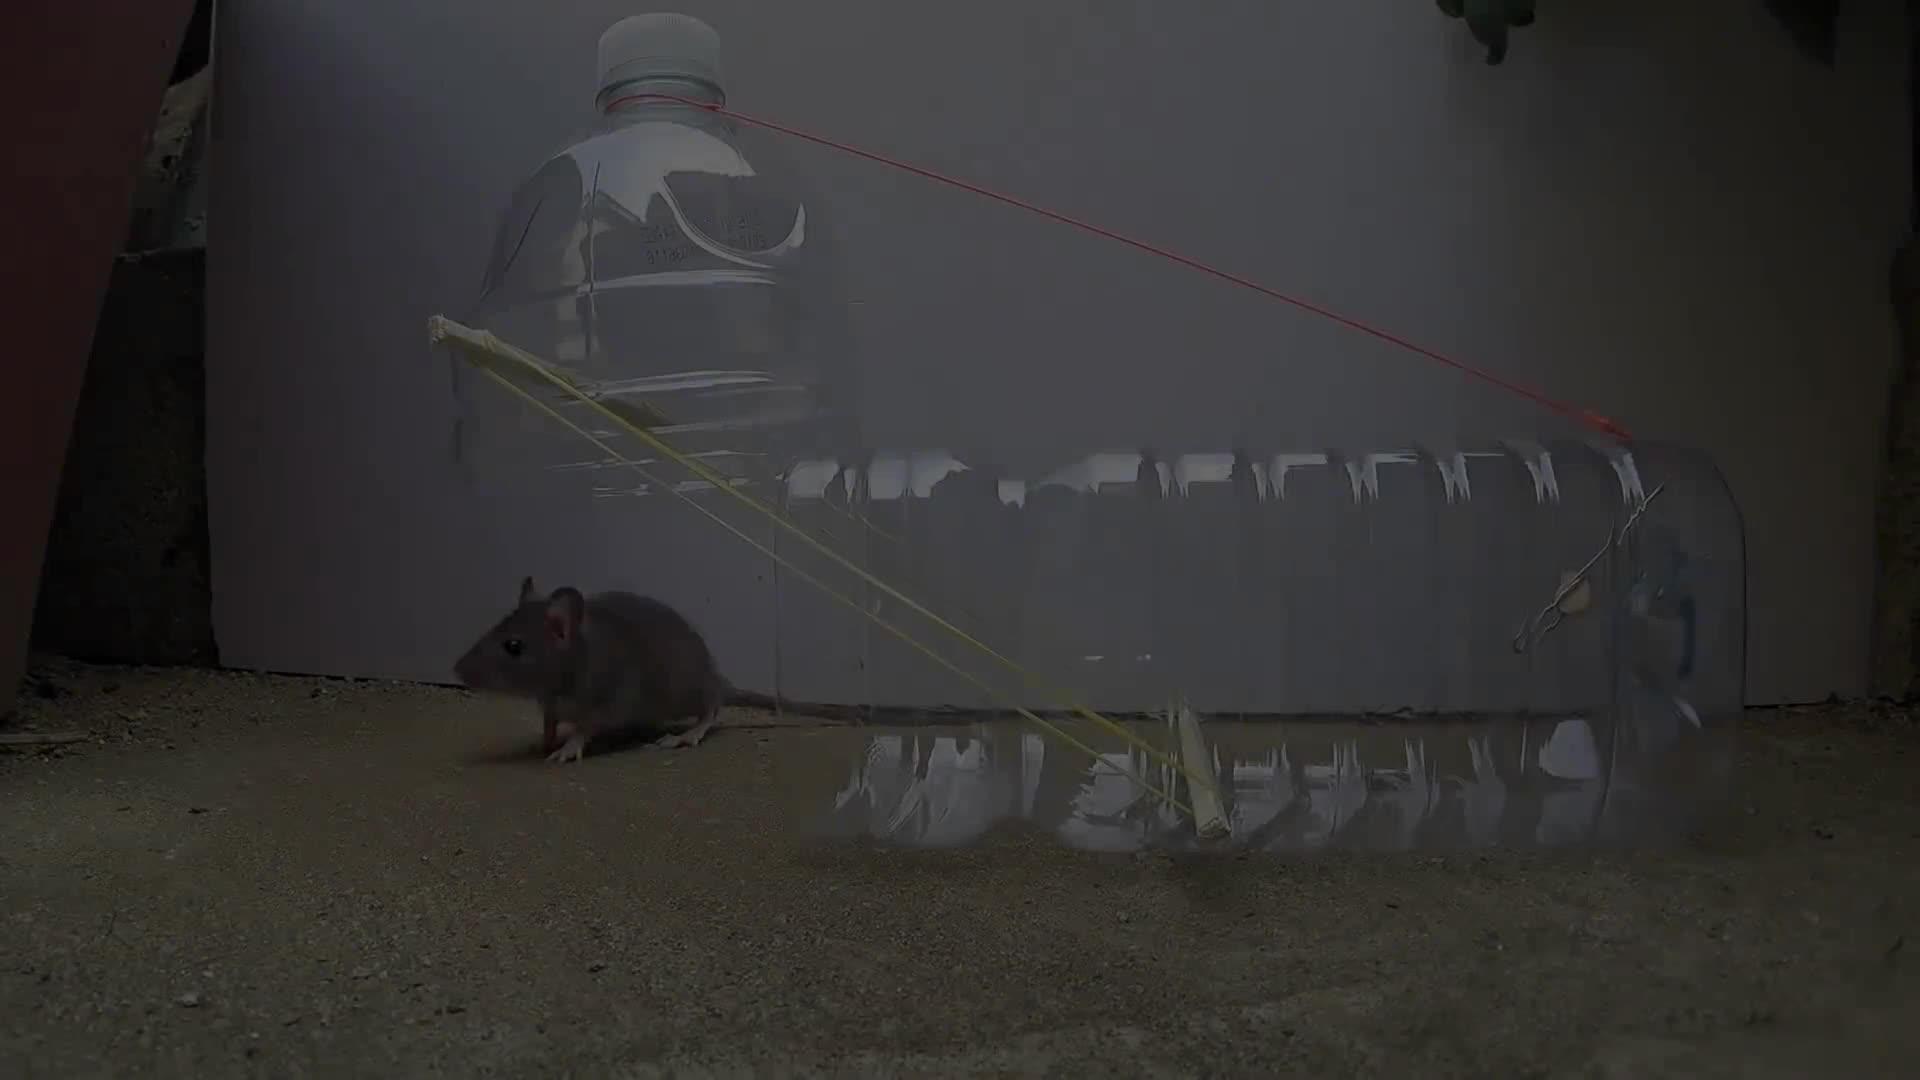 Disposable cup rat/mouse trap, Electric fan guard bird trap, How to make a mousetrap, Imaginative Guy, bird trap, mouse trap, paper mouse trap, water bottle art, 쥐덫만드는방법, 패트병쥐덫, instant regret GIFs